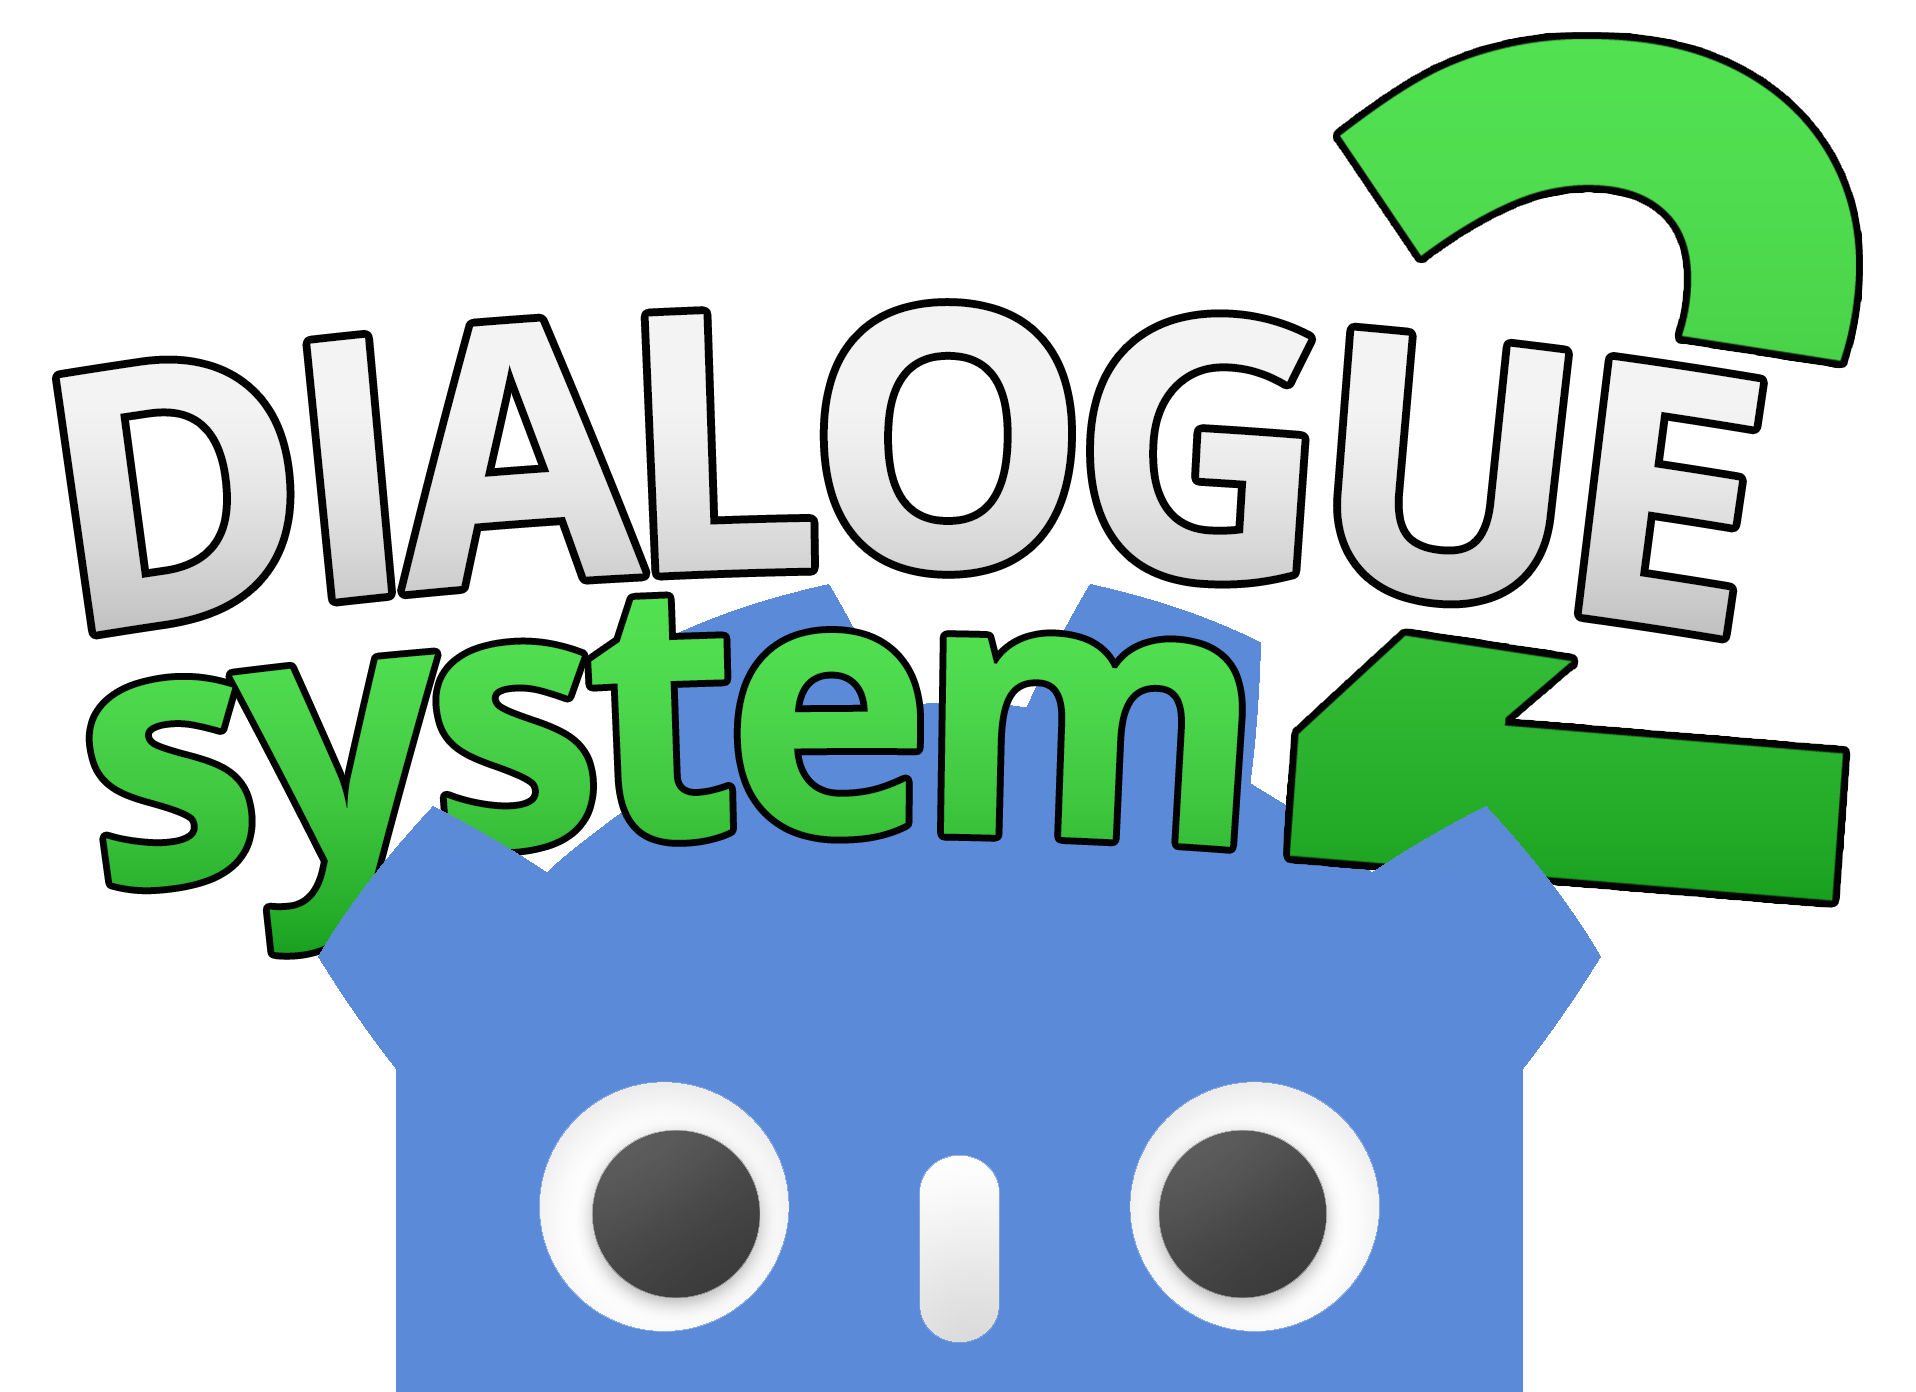 Godot Dialogue System 2